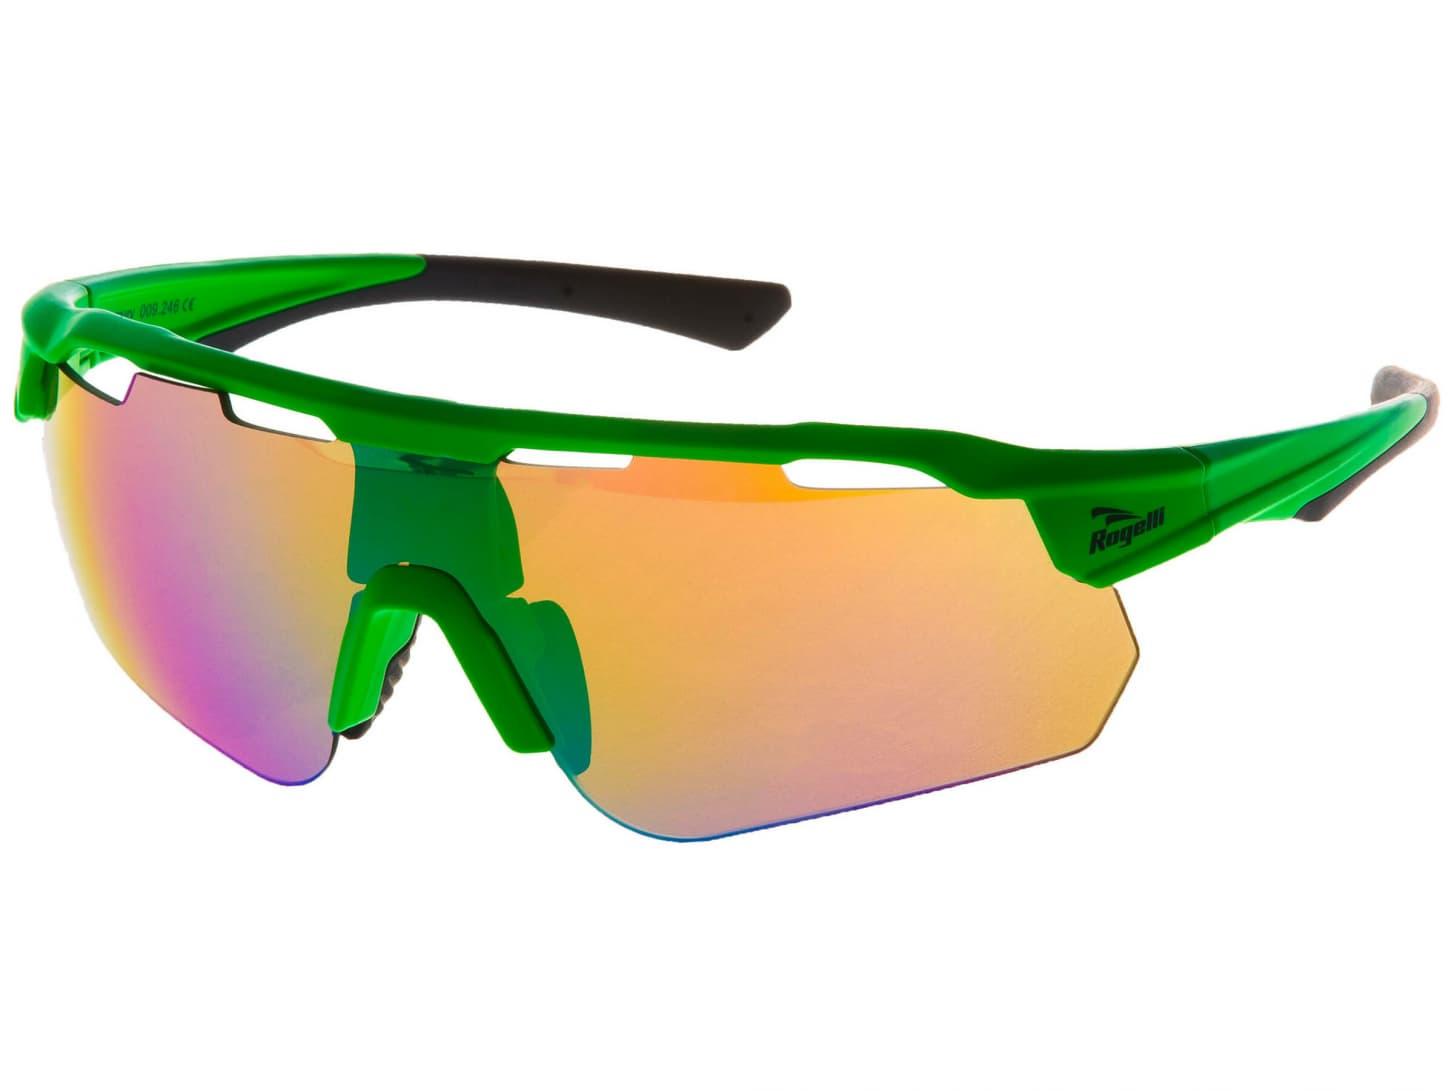 a44644c40 Cyklistické okuliare Rogelli MERCURY s výmennými sklami, zelené ...